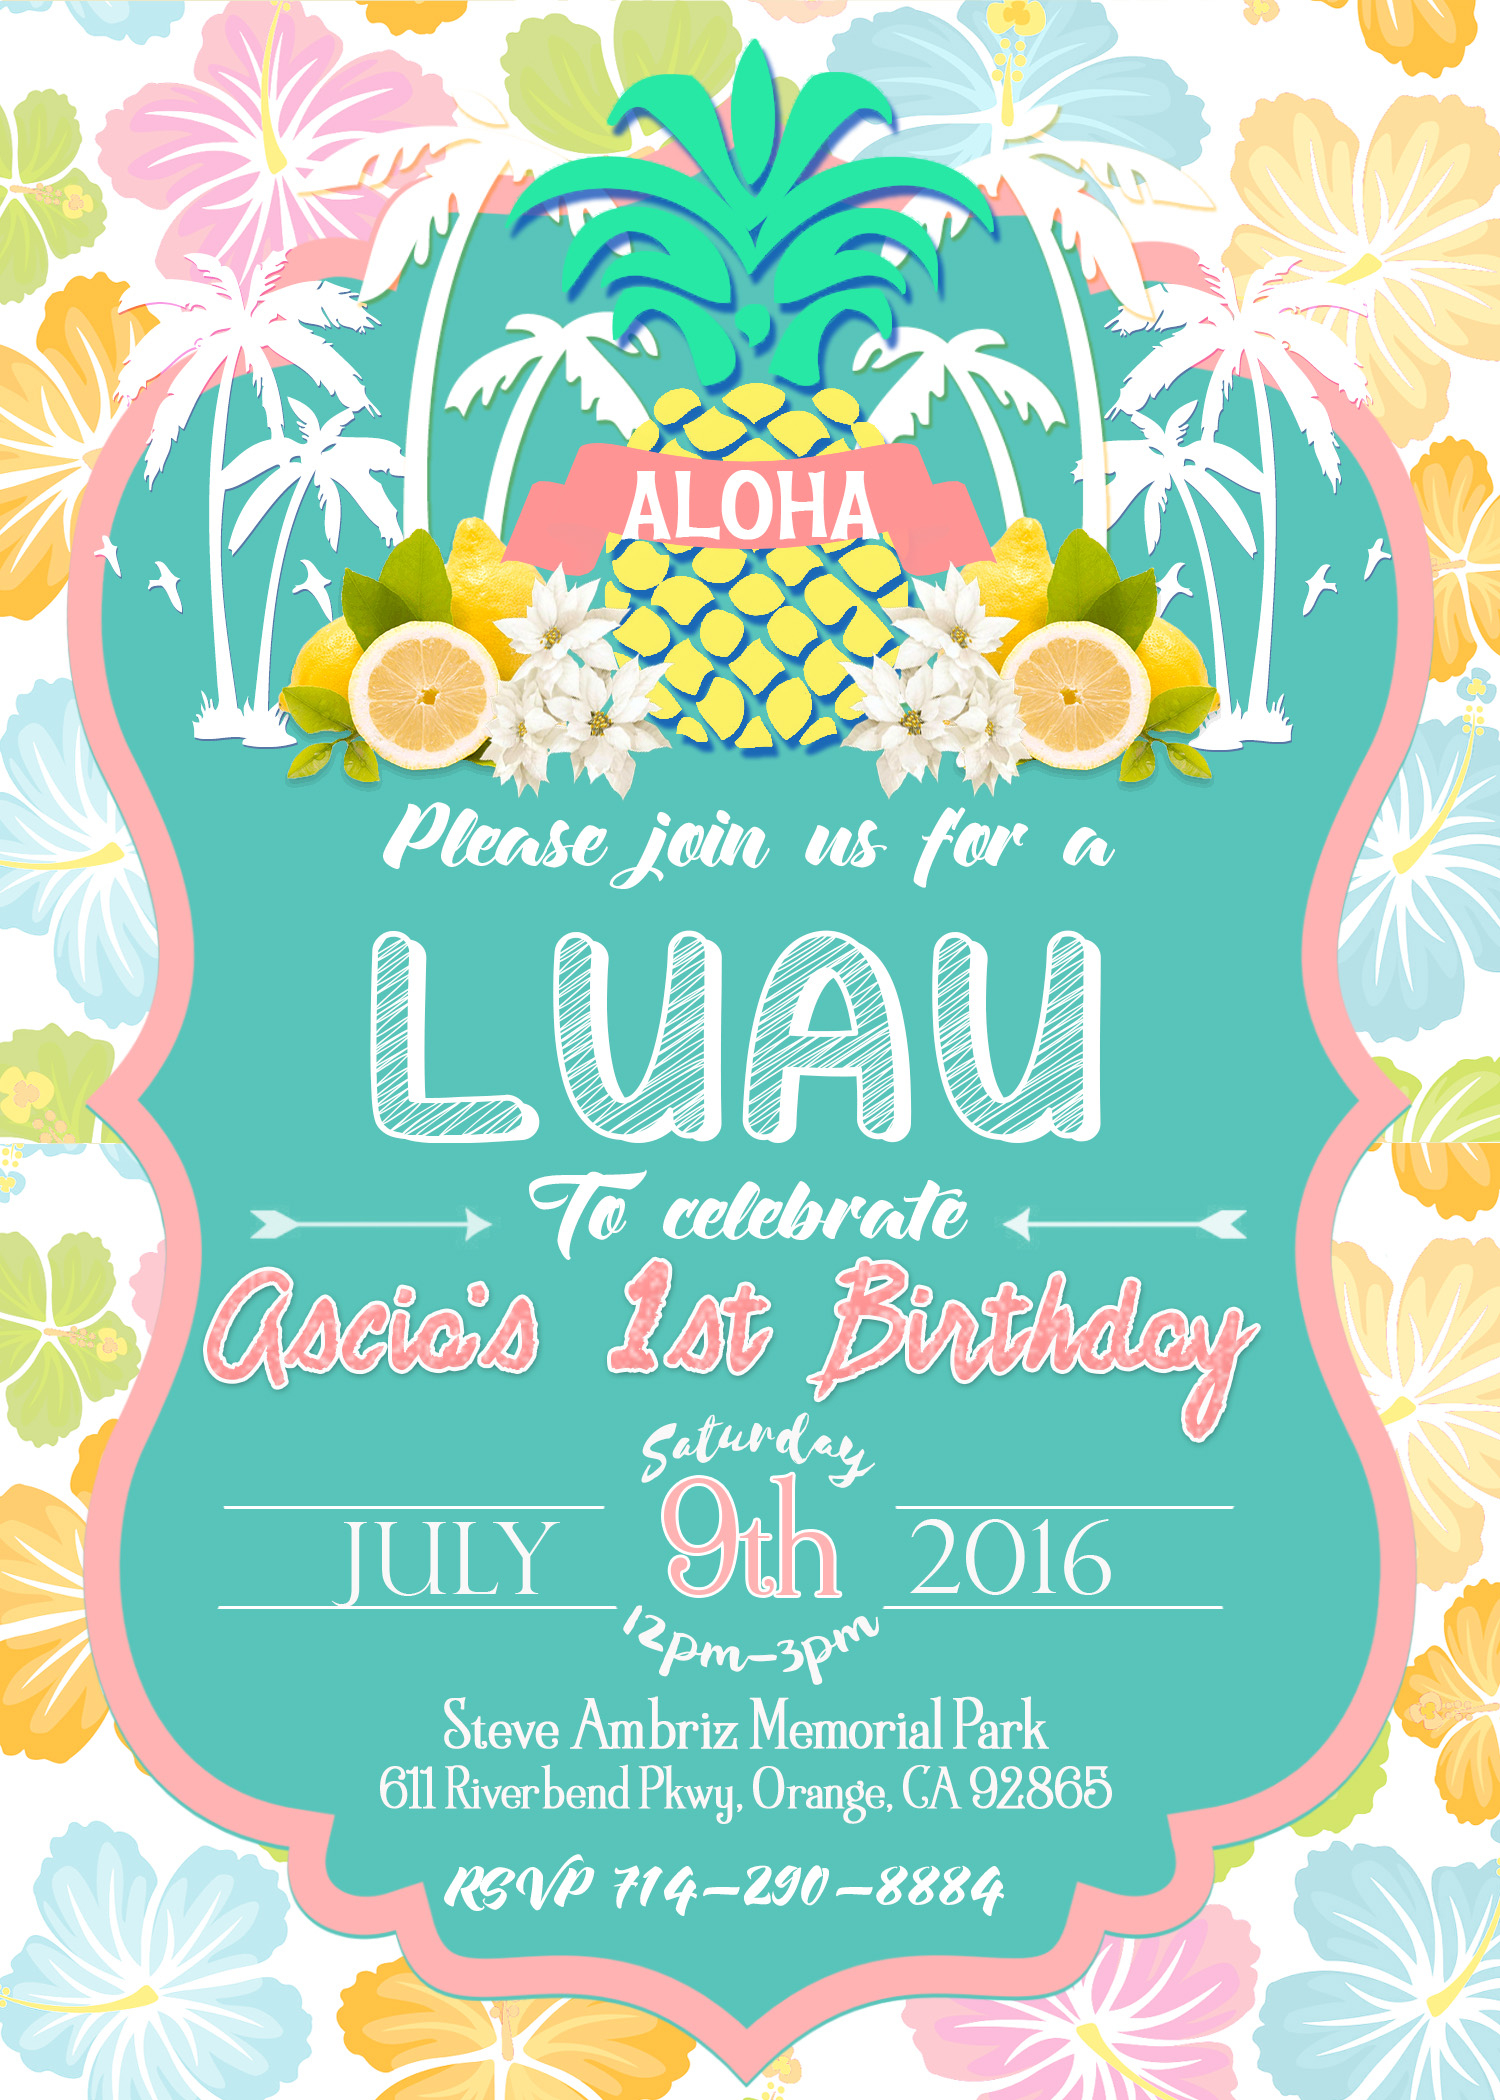 Luau Birthday Clipart Collection - Hawaiian Party Invitations Free Printable